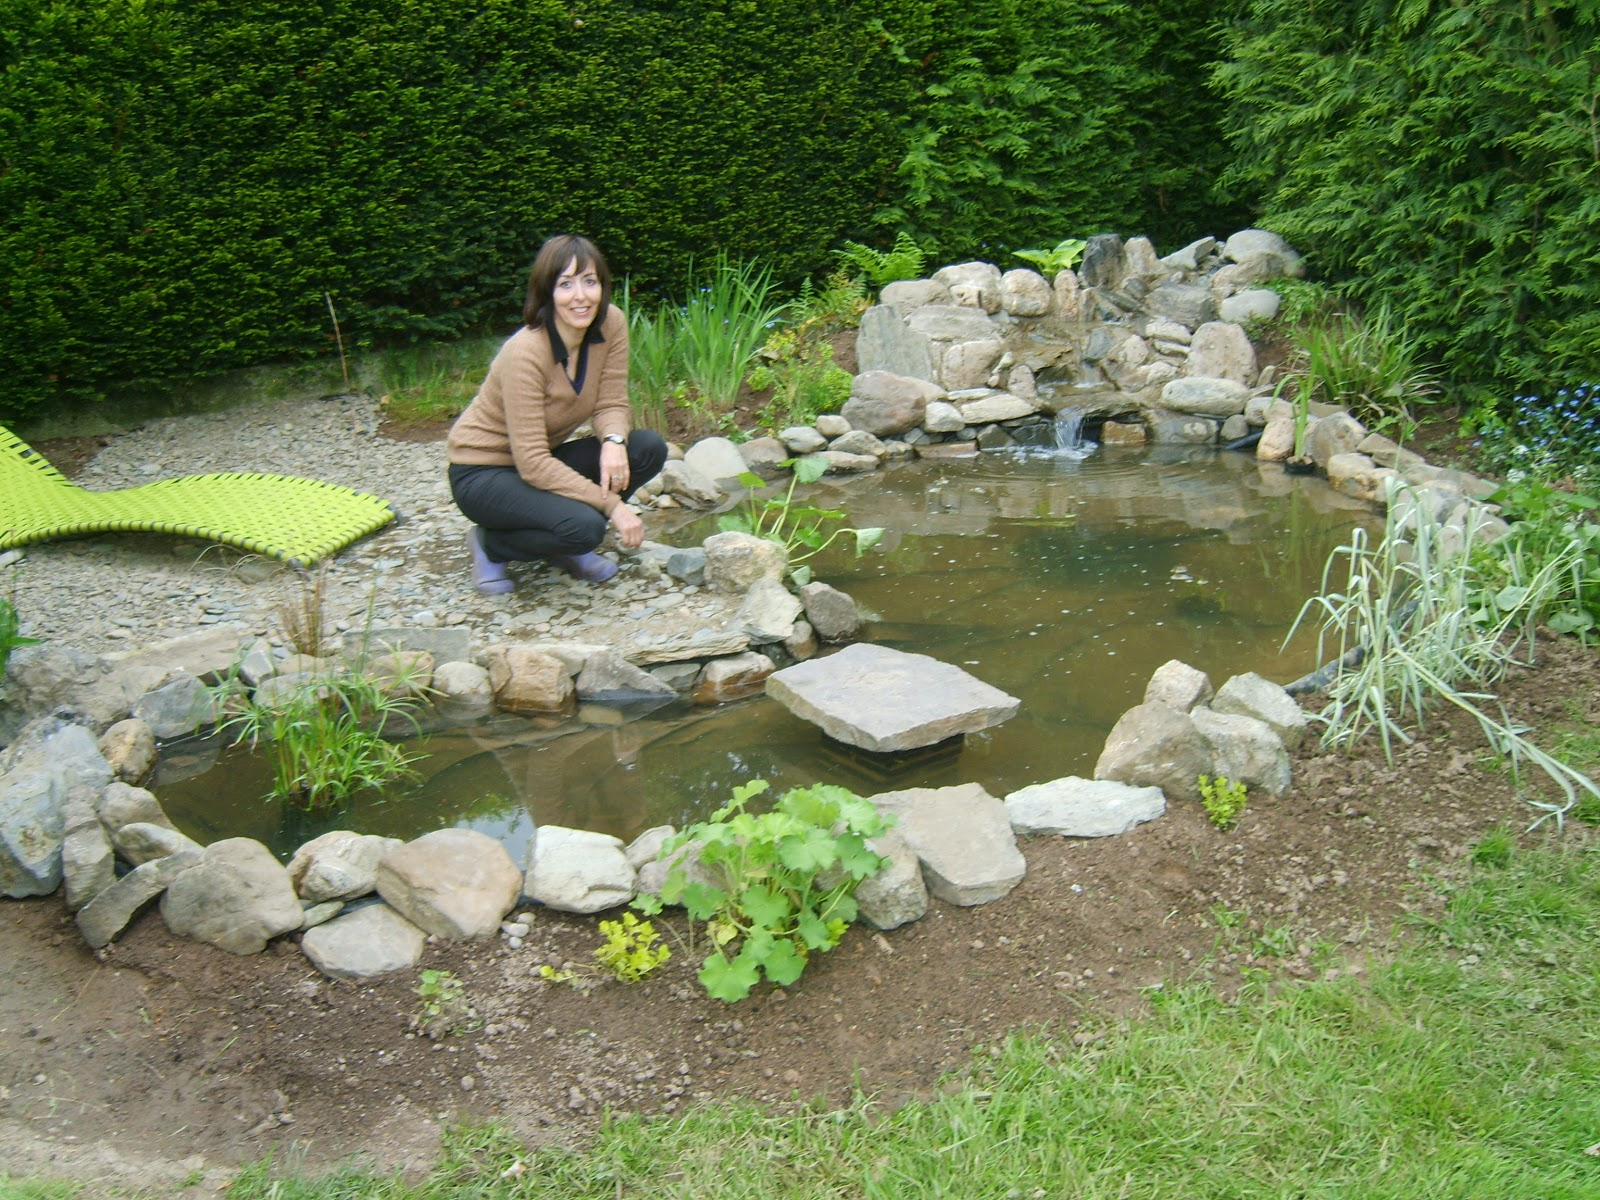 La passion d 39 anne marie ma mare sans canard fin - Faire une mare dans son jardin ...